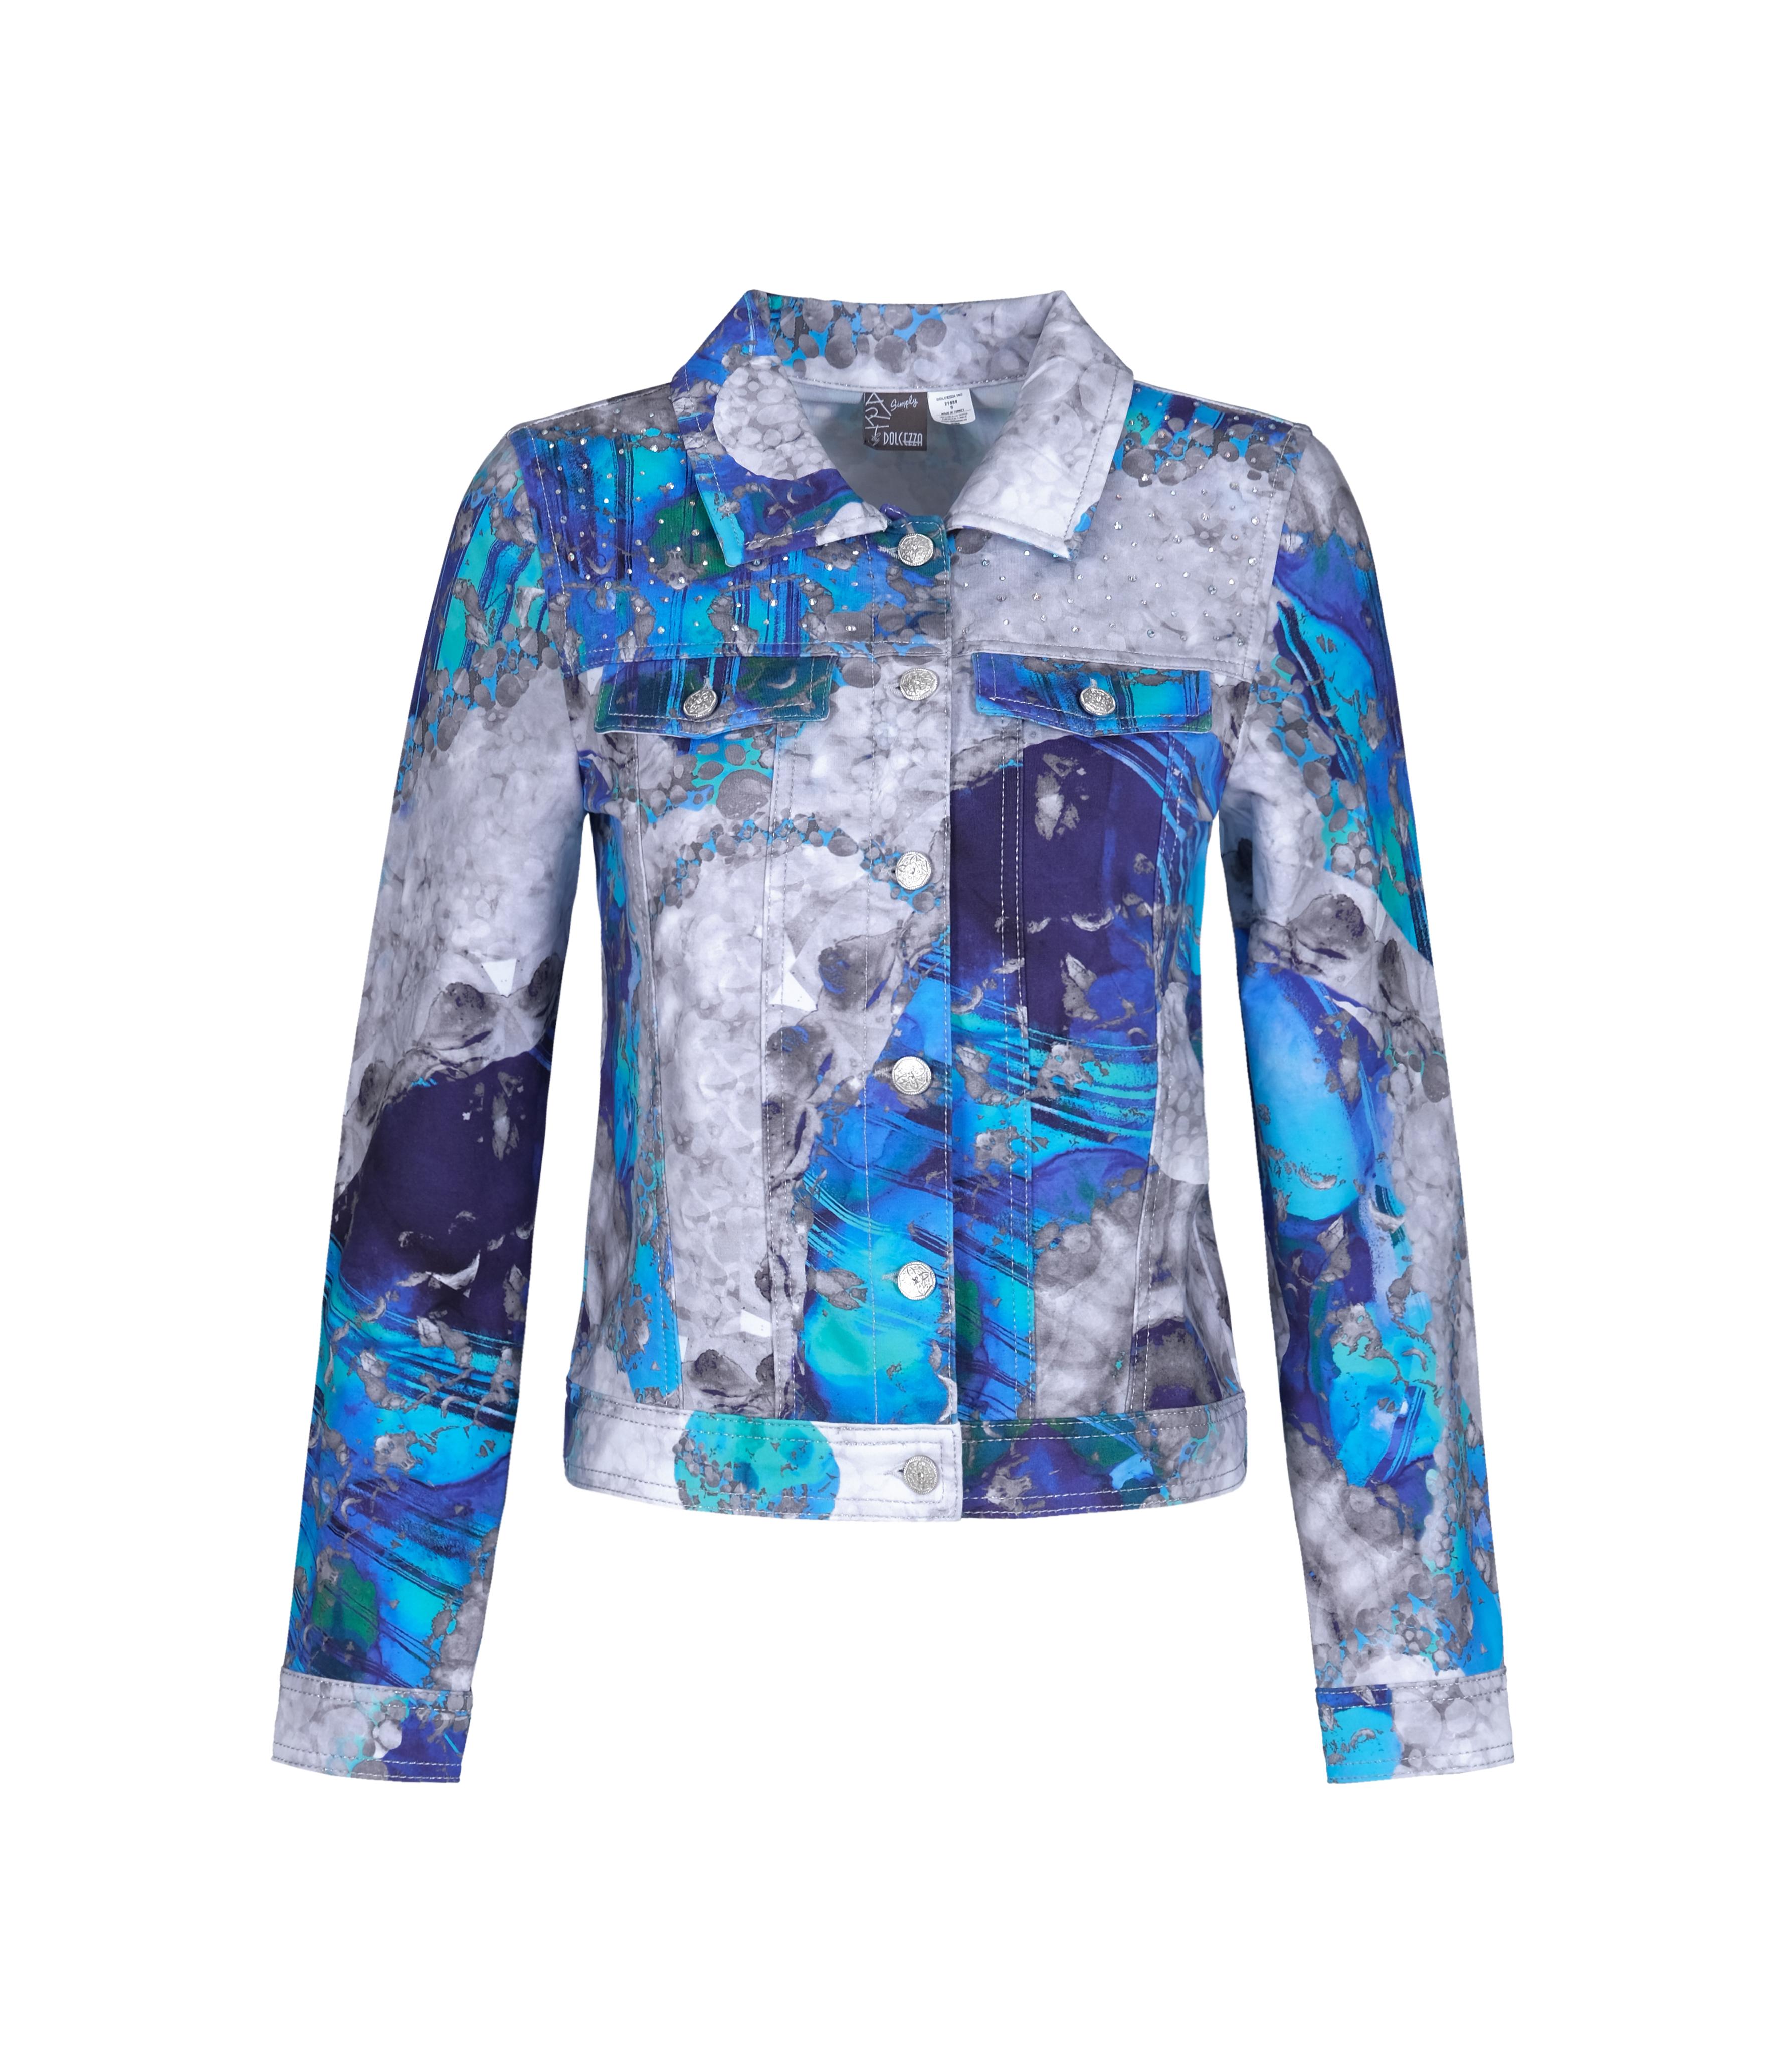 Simply Art Dolcezza: Blue & White Yin Yang Art soft Denim Jacket (1 Left!)